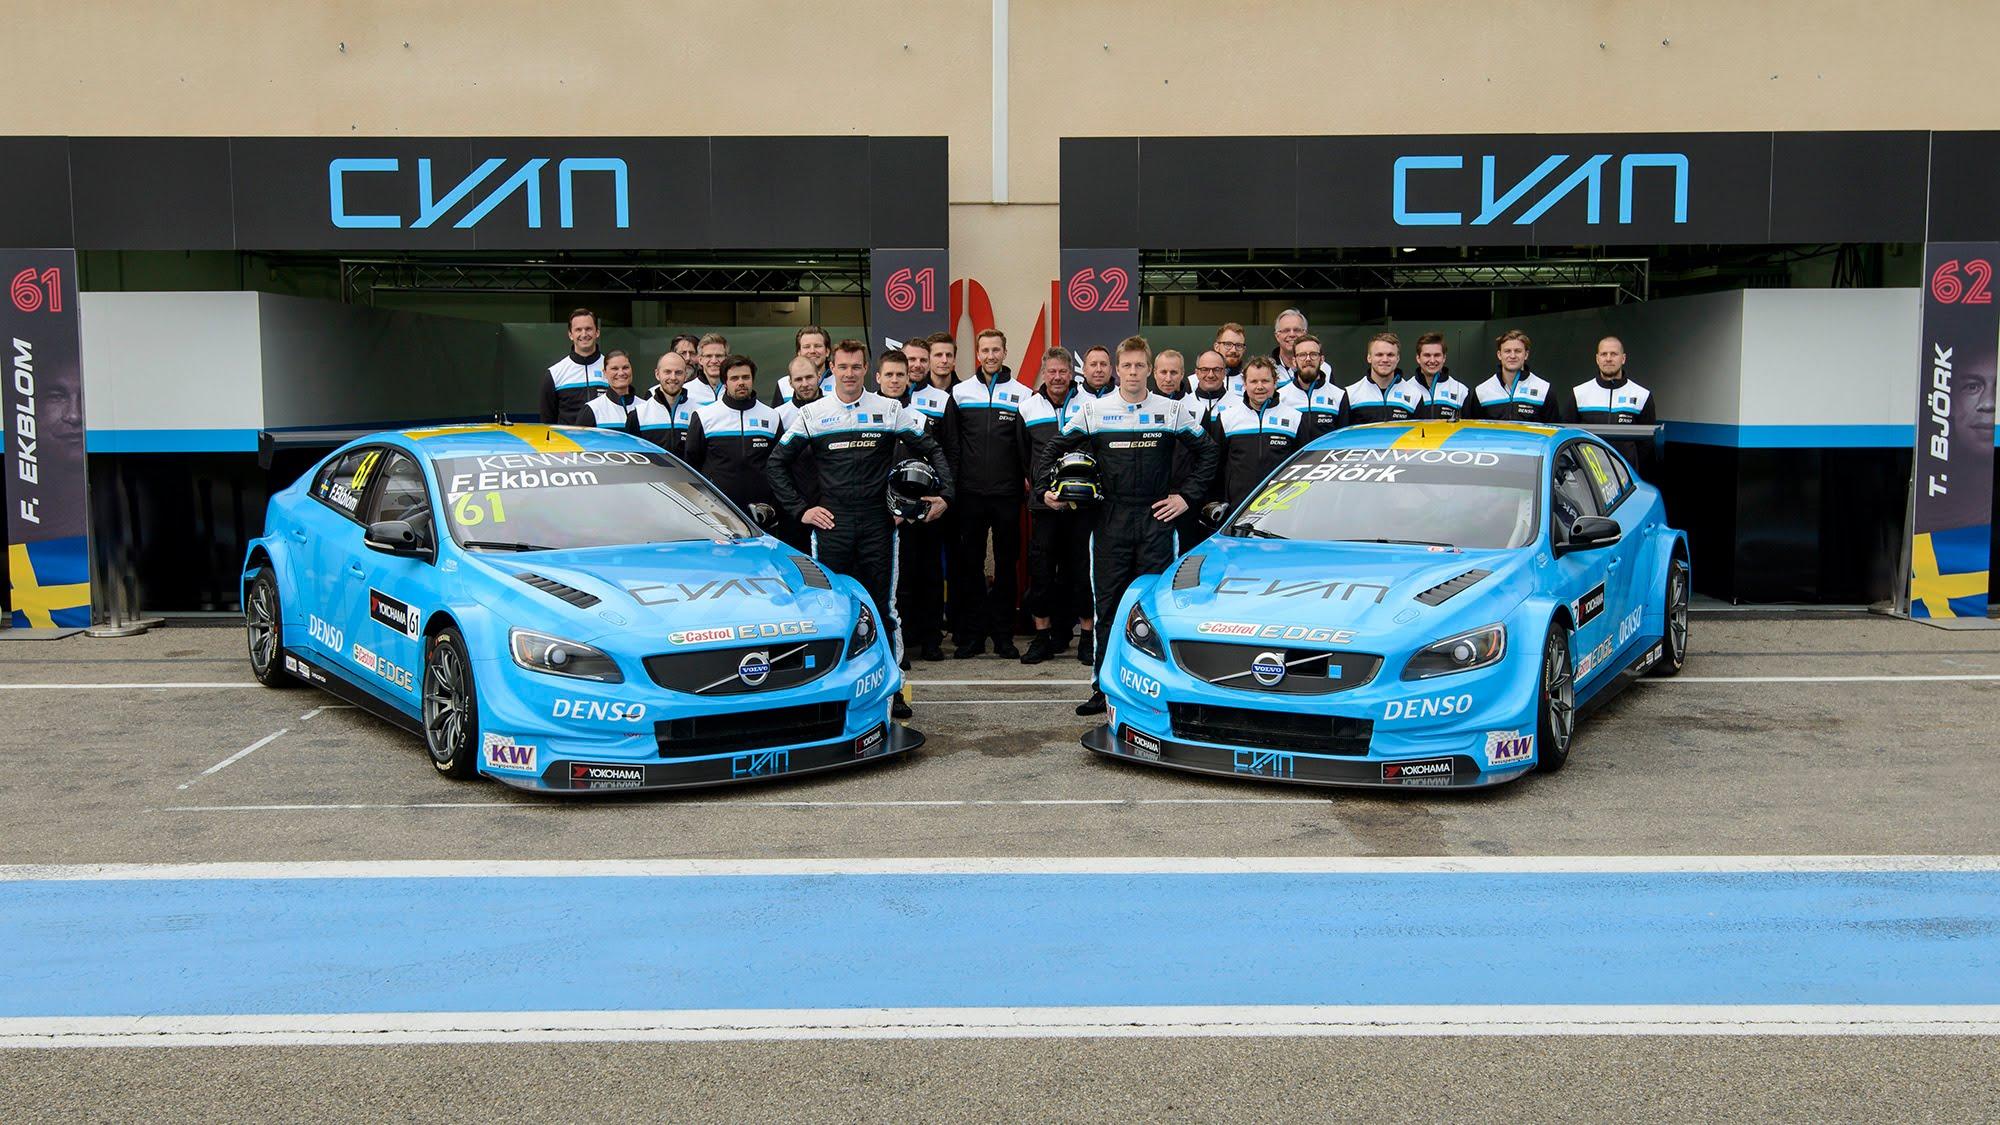 Used Volvo S60 >> WTCC Volvo S60 Polestar TC1 Is Headed For RaceRoom